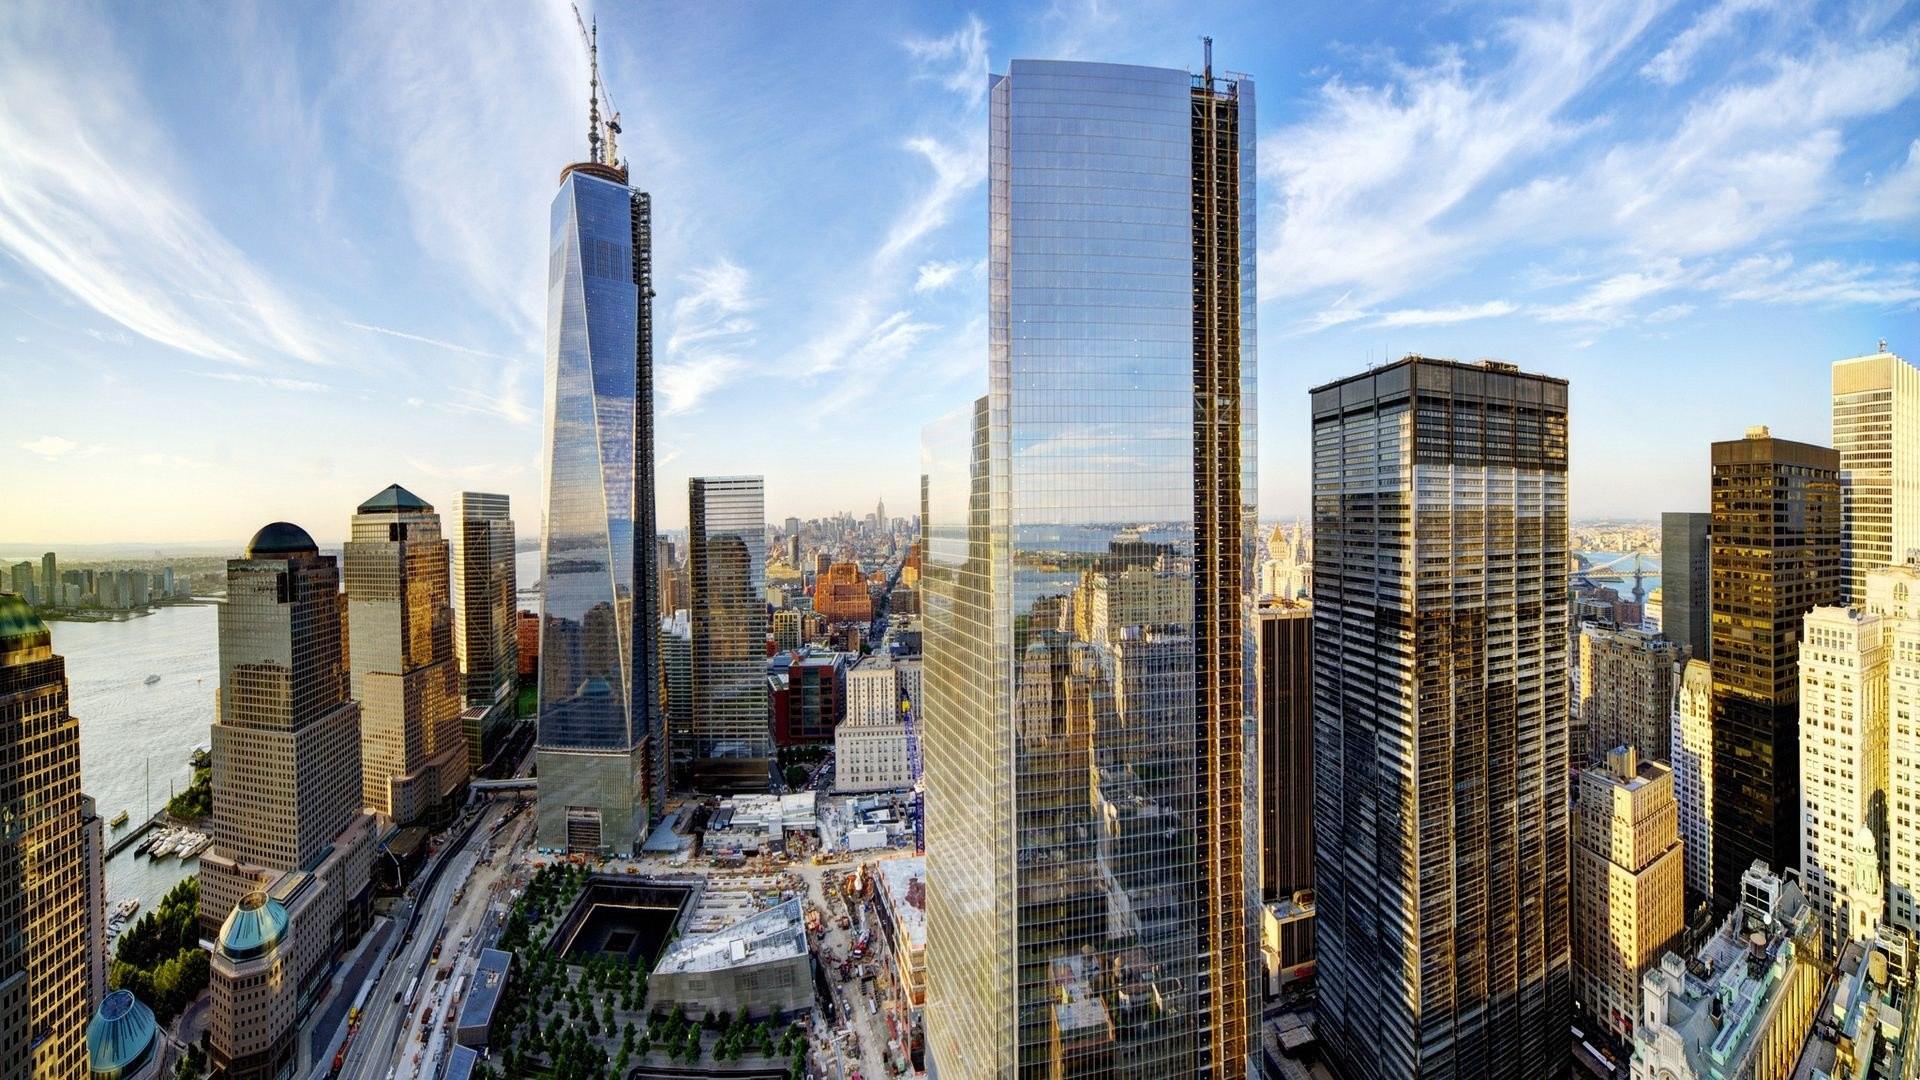 WTC WORLD TRADE CENTER skyscraper city cities building new york wallpaper |  | 420085 | WallpaperUP